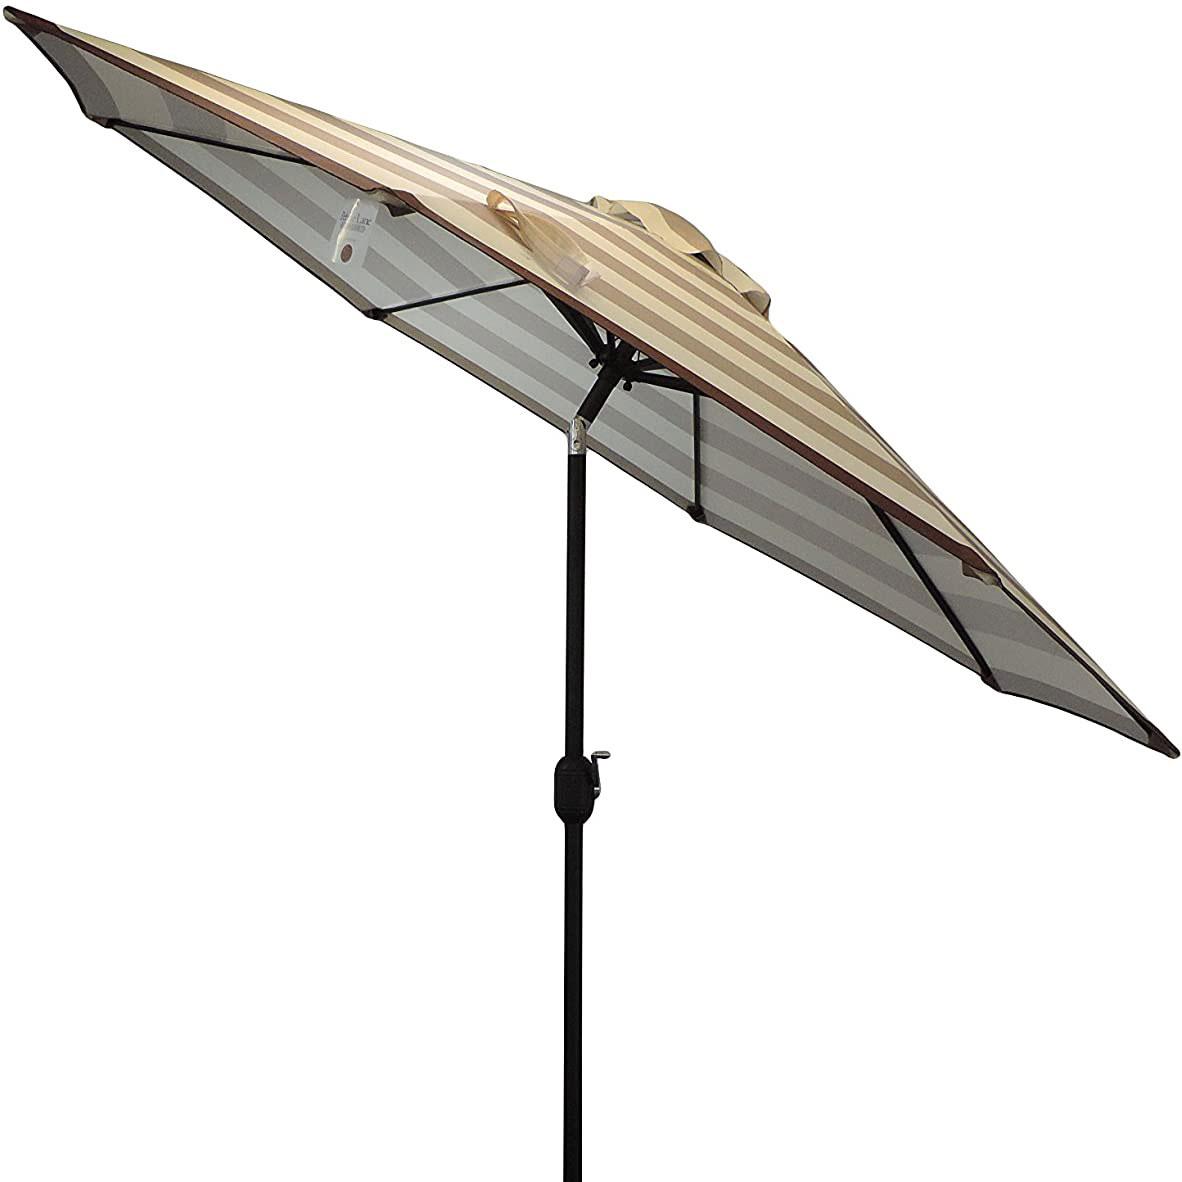 Pebble Lane Living Premium 9 Ft Market Patio Umbrella ... on Pebble Lane Living id=56308